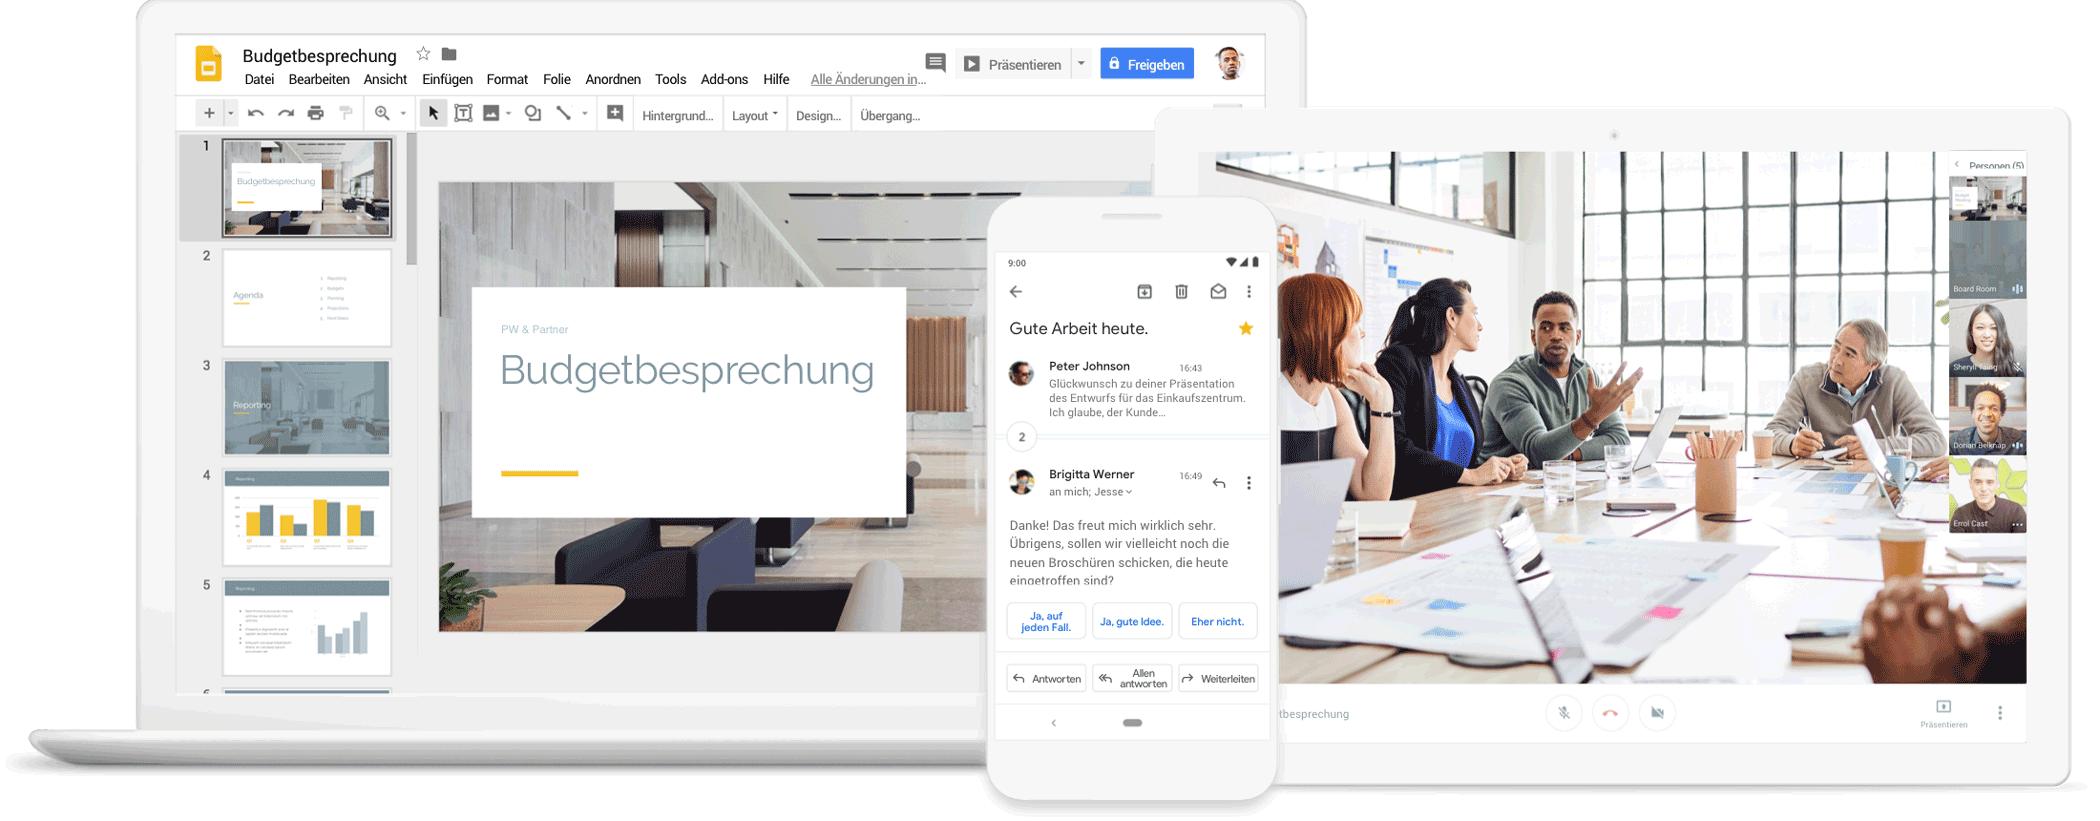 Google G Suite Tools im Einsatz